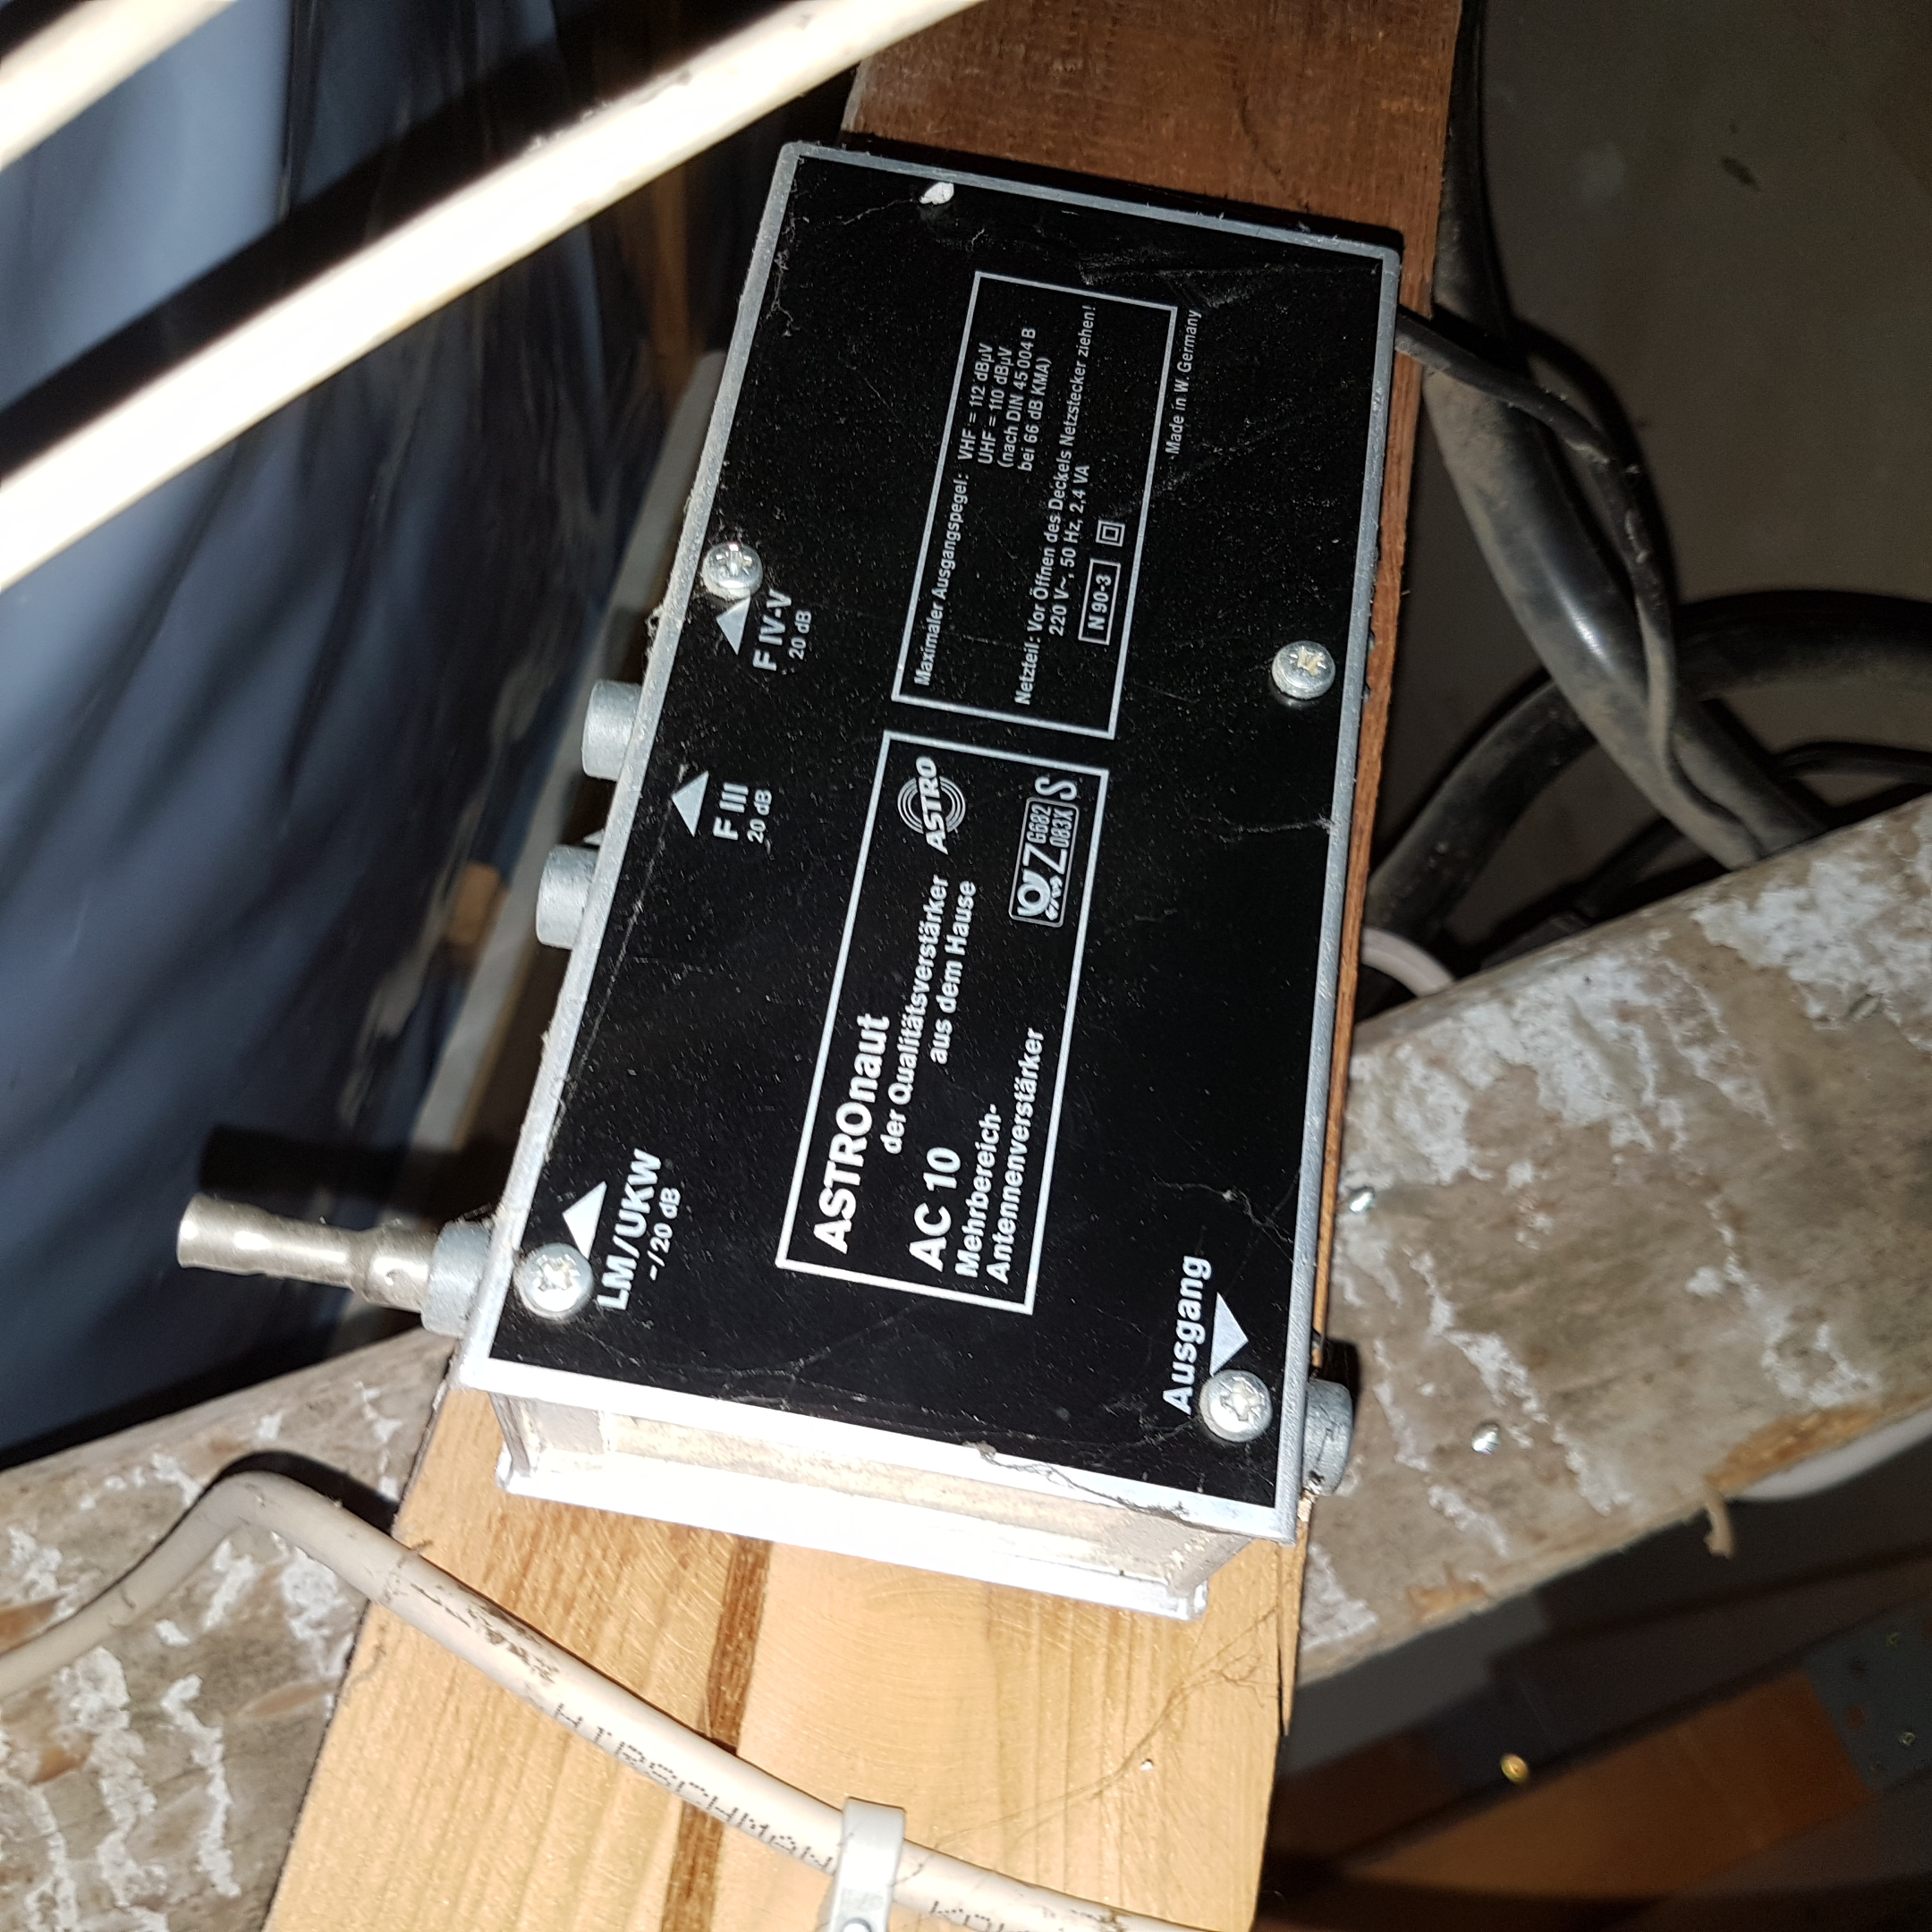 alten antennenverst rker f r dvb t2 nutzen technik film. Black Bedroom Furniture Sets. Home Design Ideas